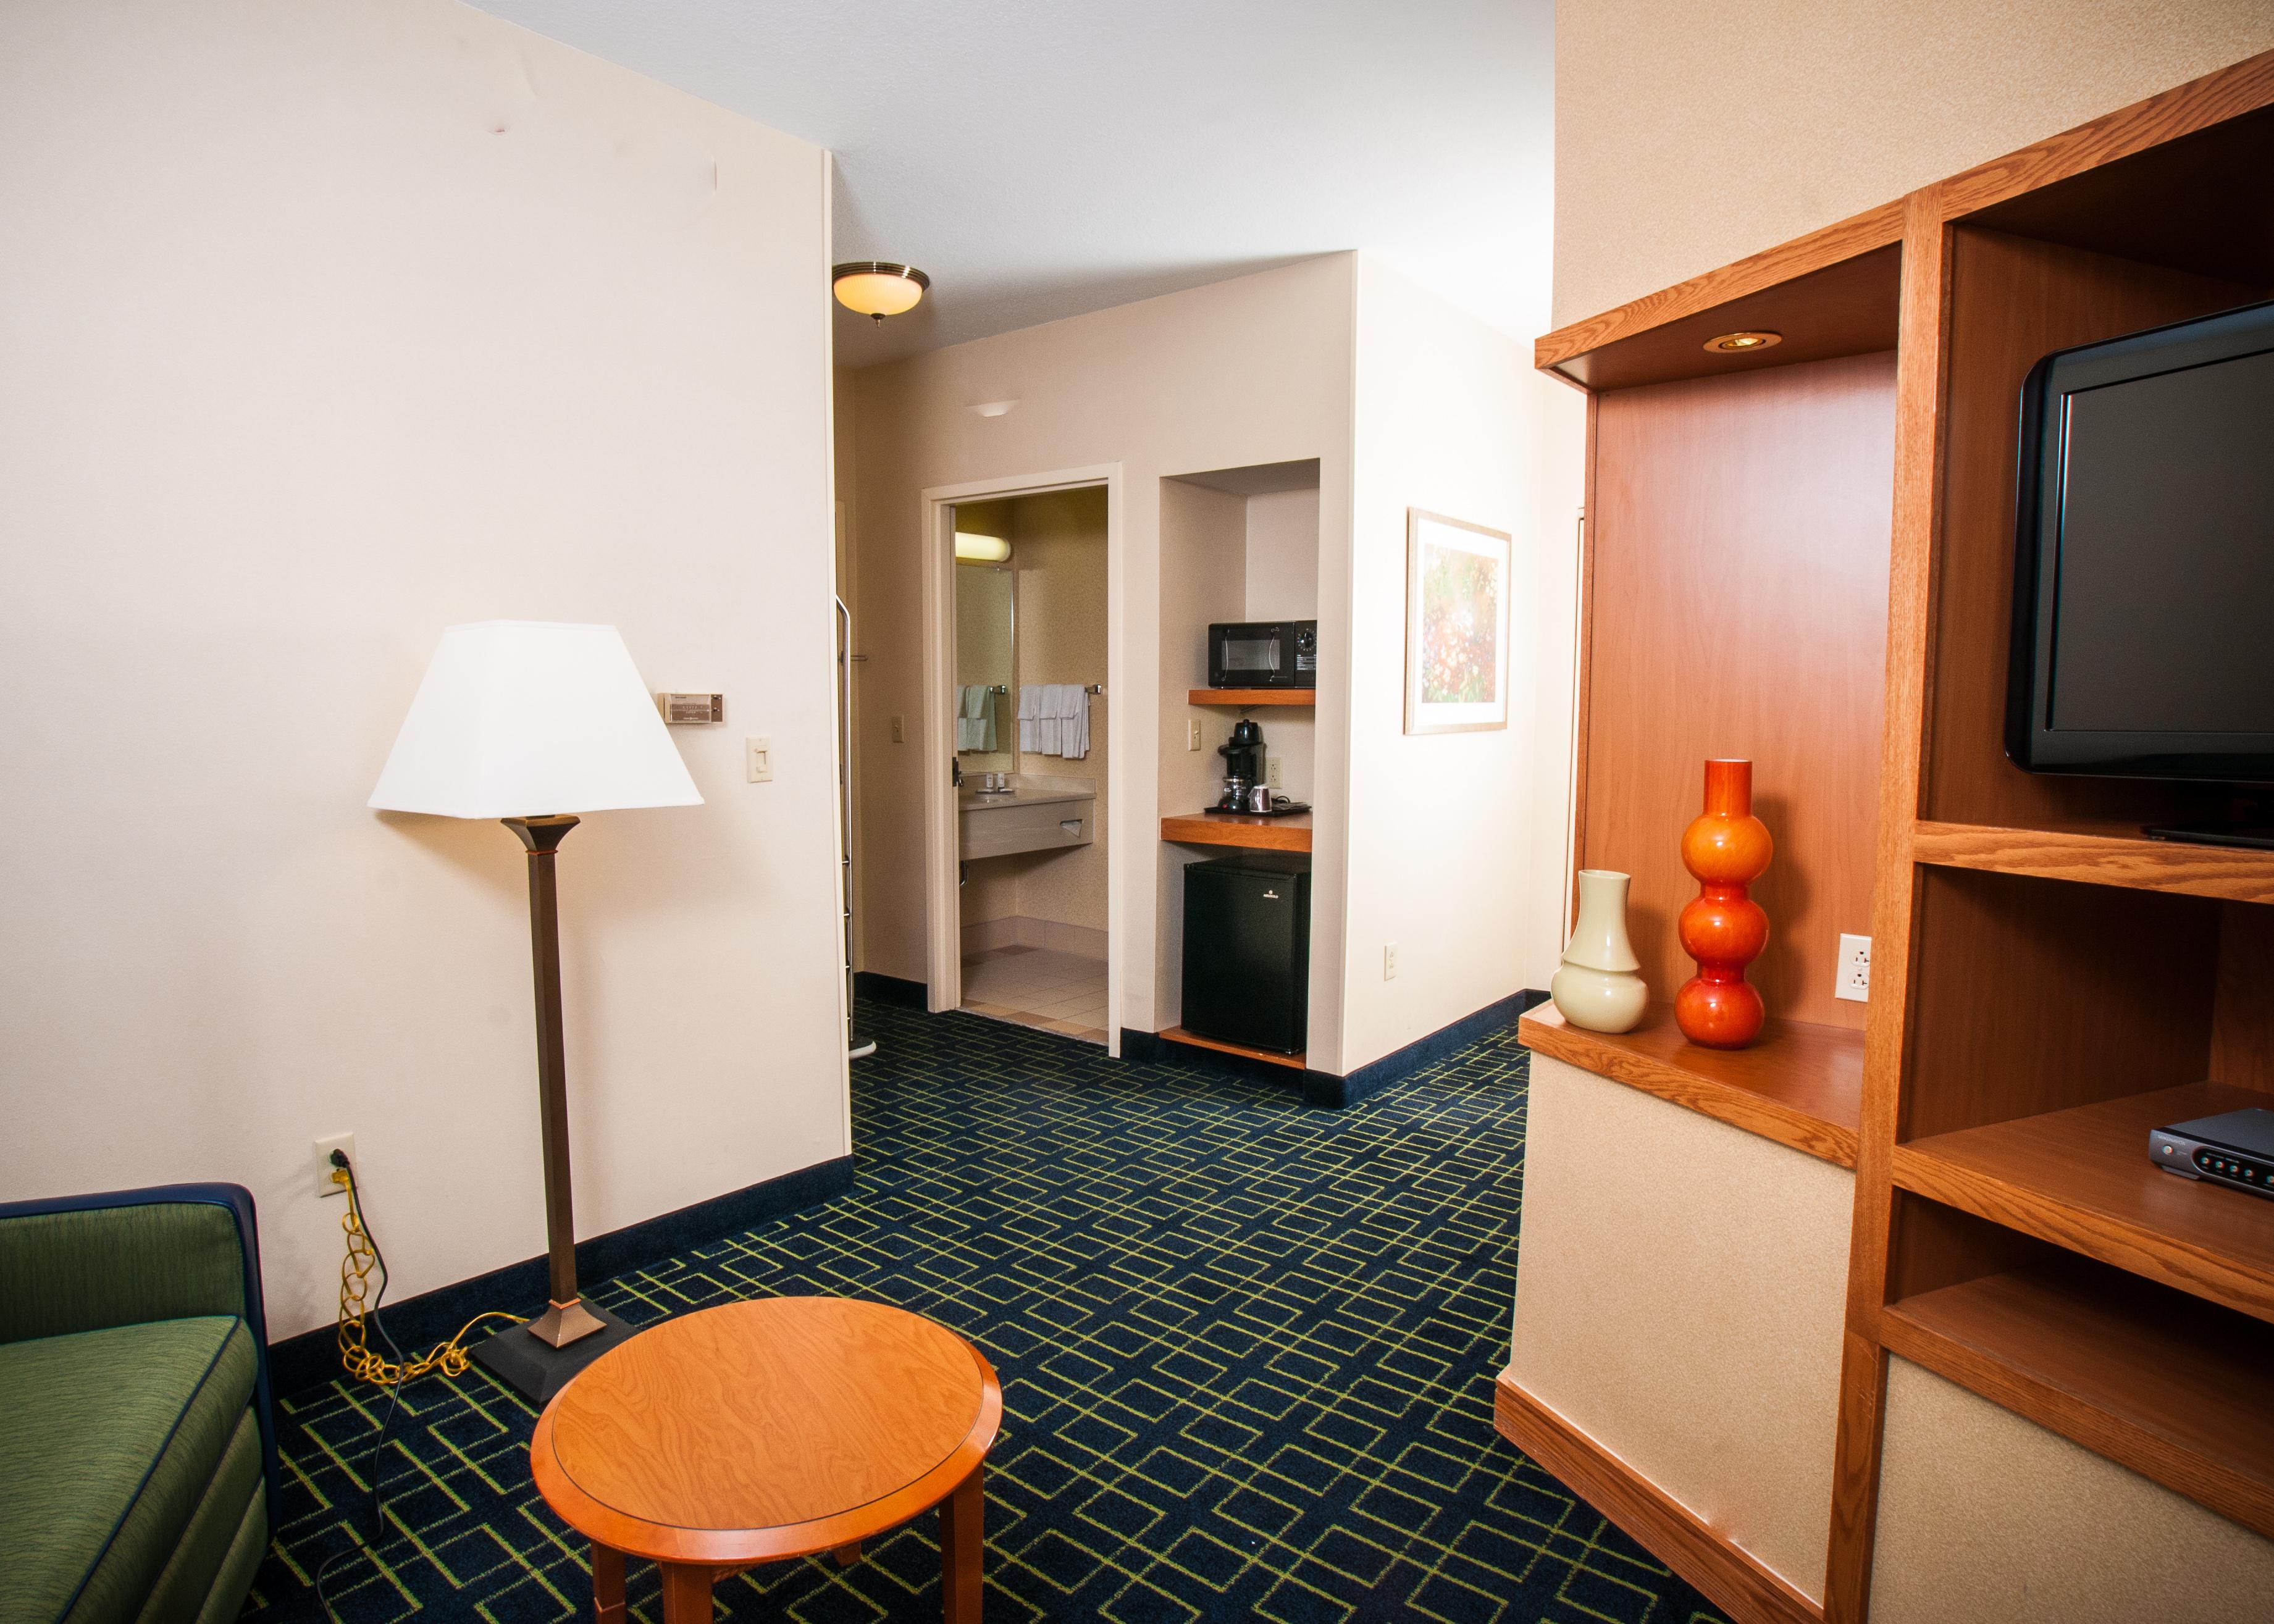 Fairfield Inn & Suites by Marriott Akron South image 16